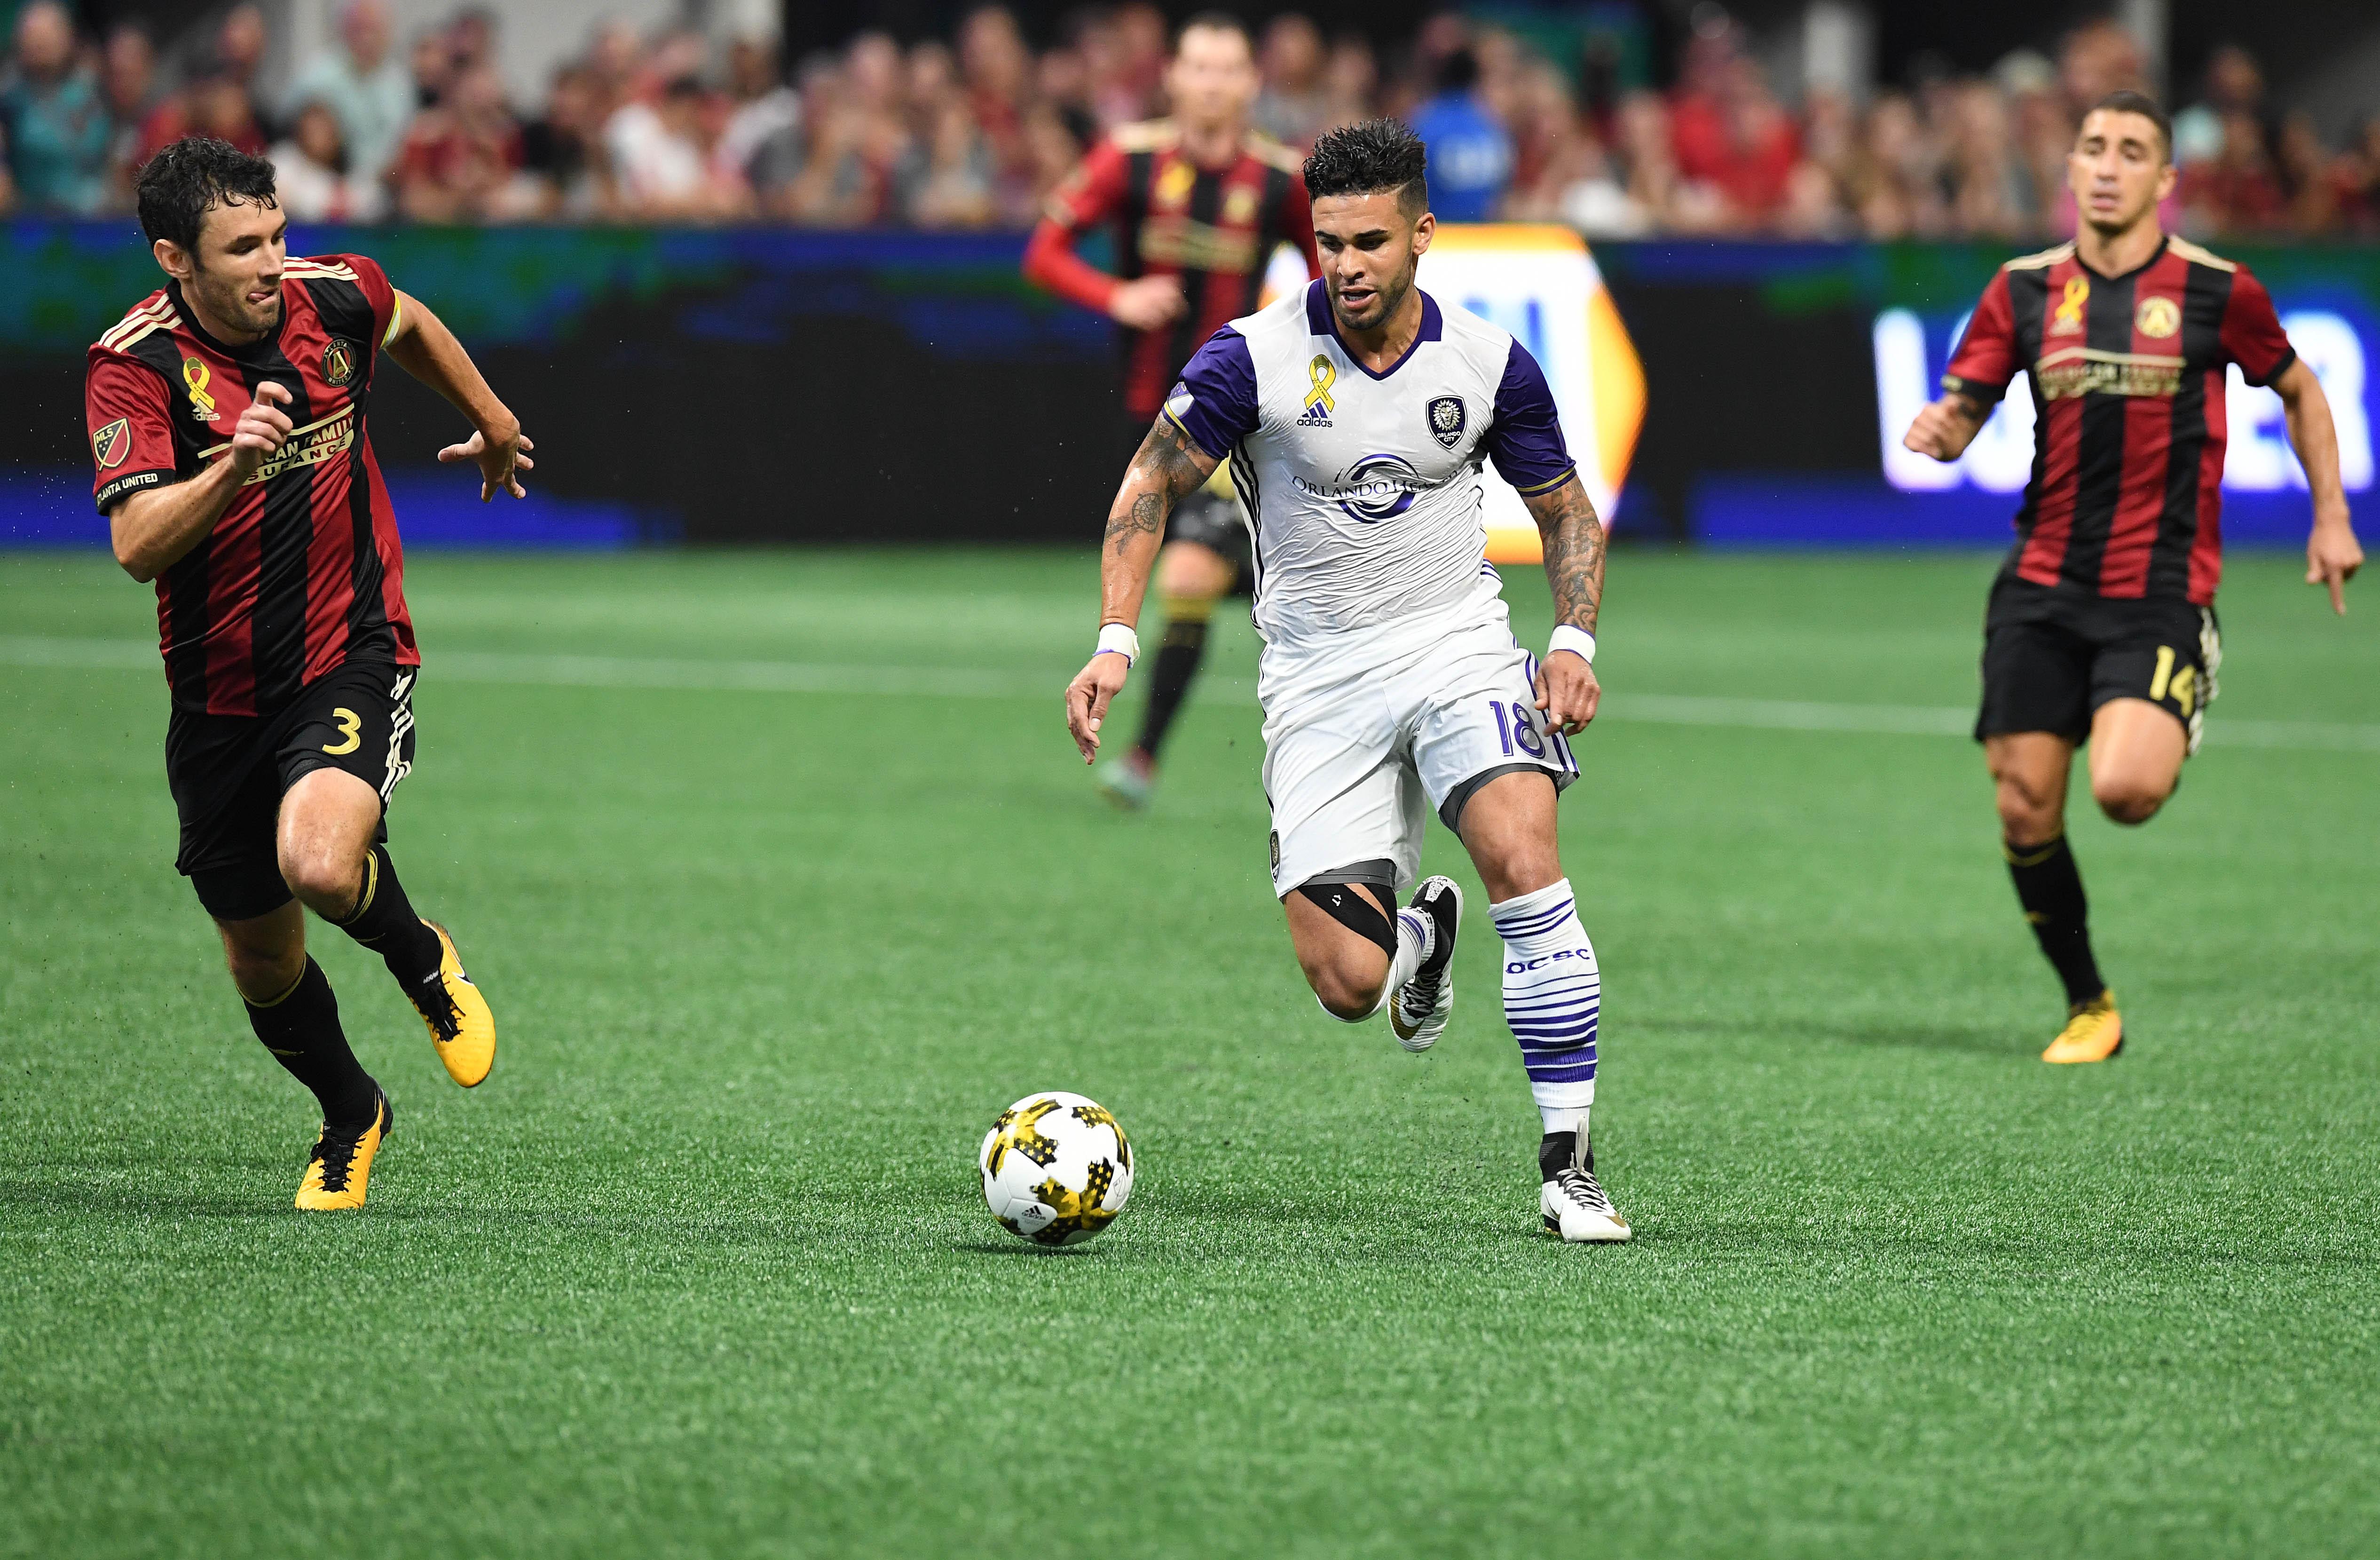 MLS: Orlando City SC at Atlanta United FC